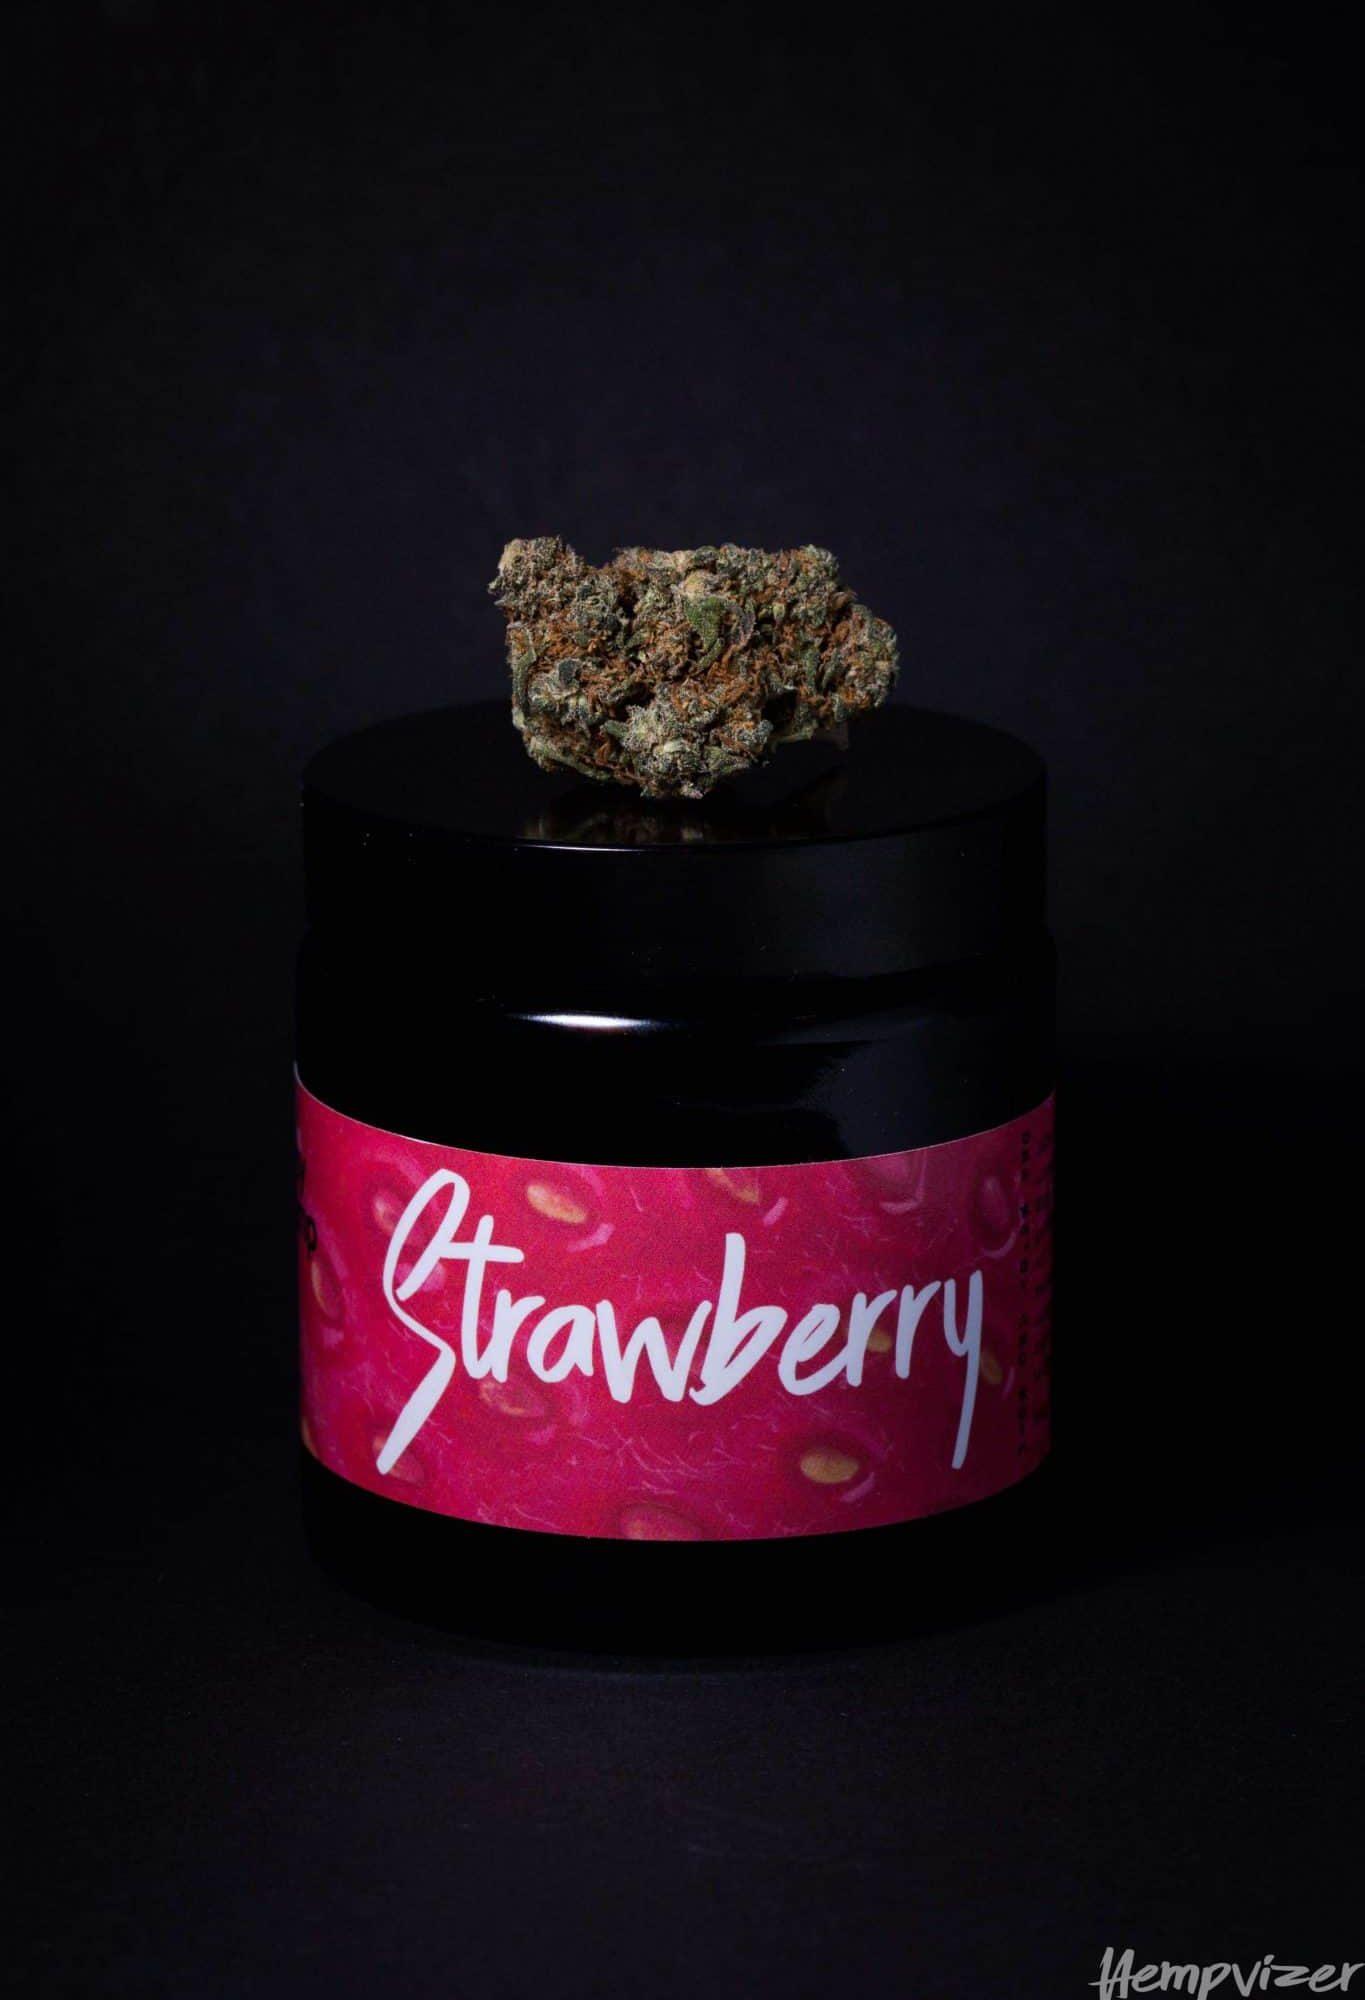 Strawberry 3-6% CBD